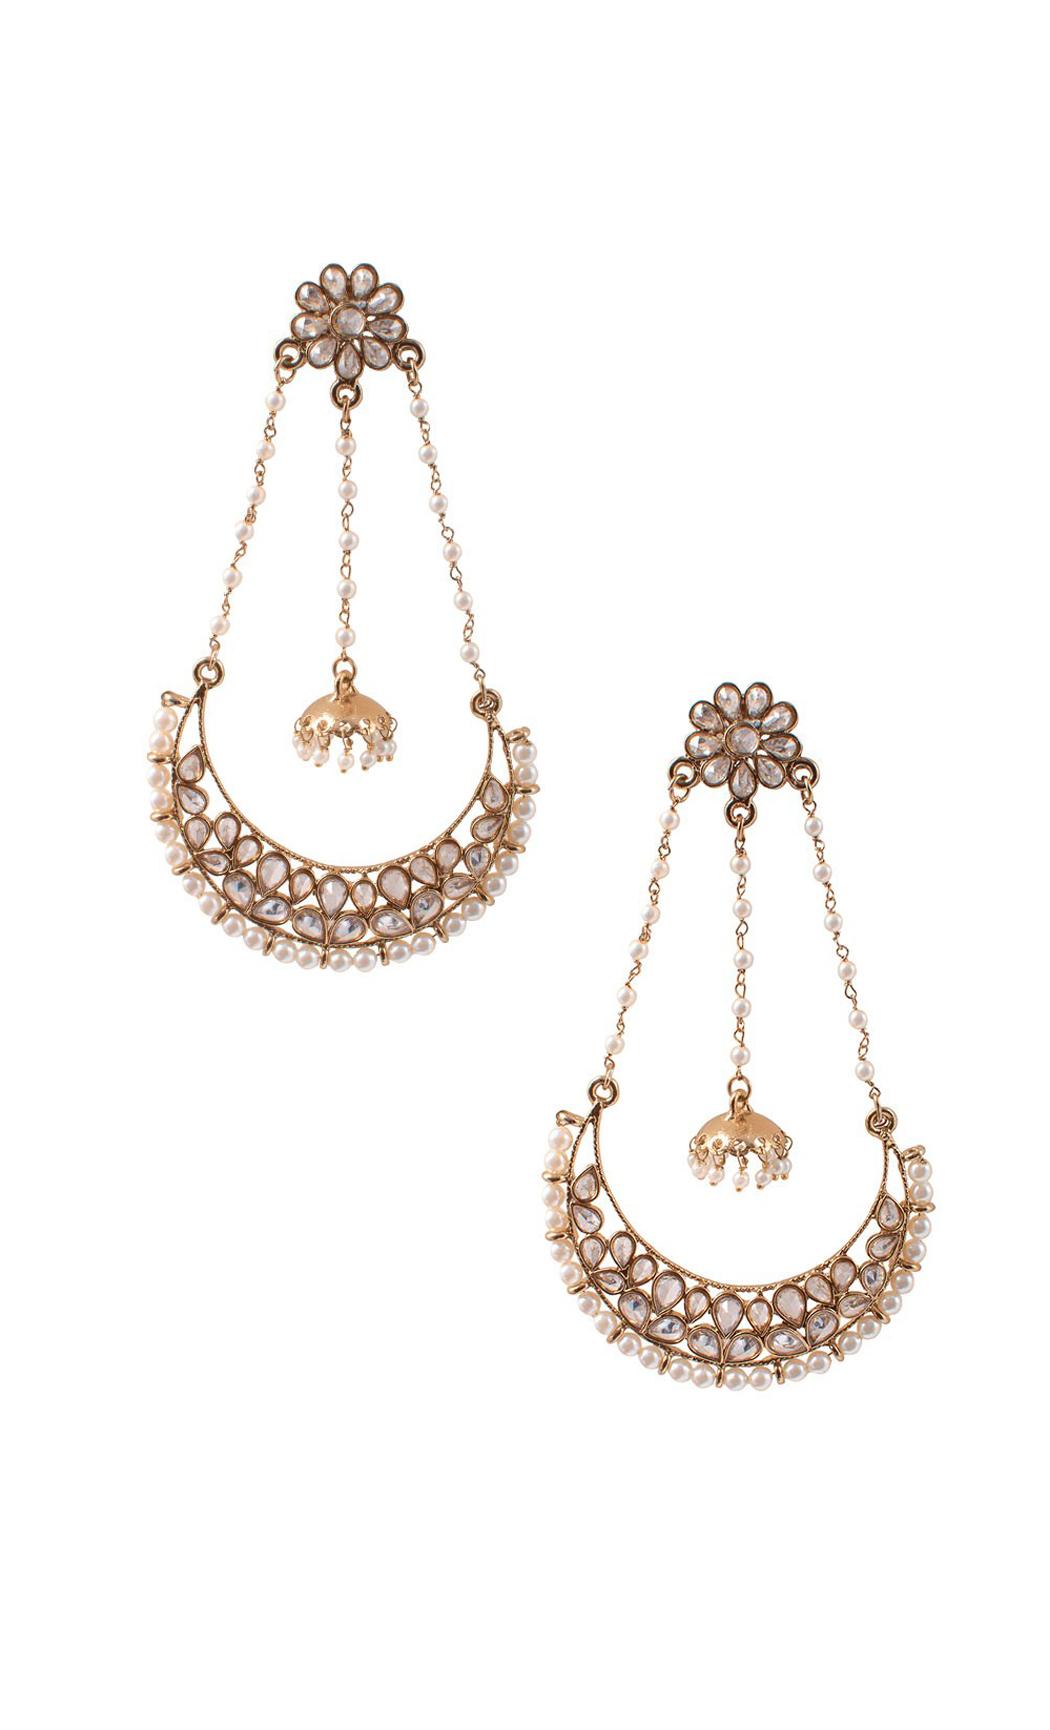 Pearl Encrusted Chandelier Earrings - Shop Online